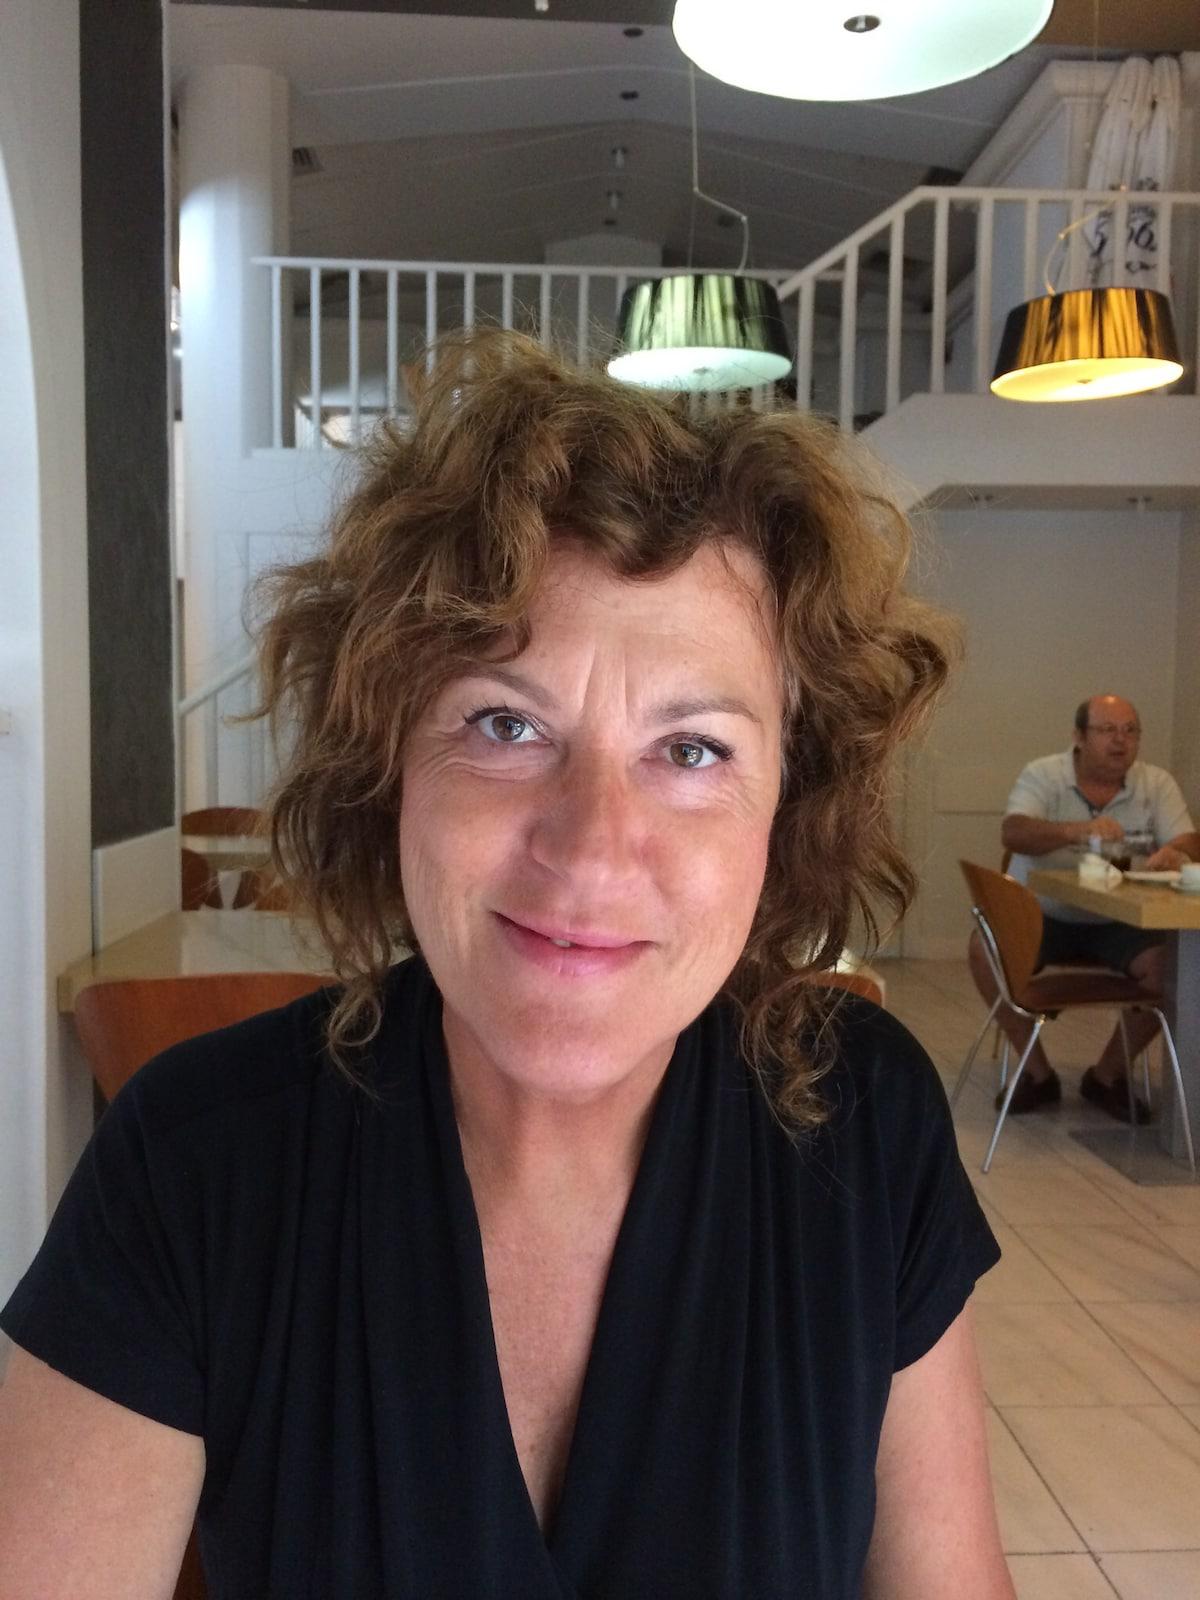 Debbie from Eindhoven